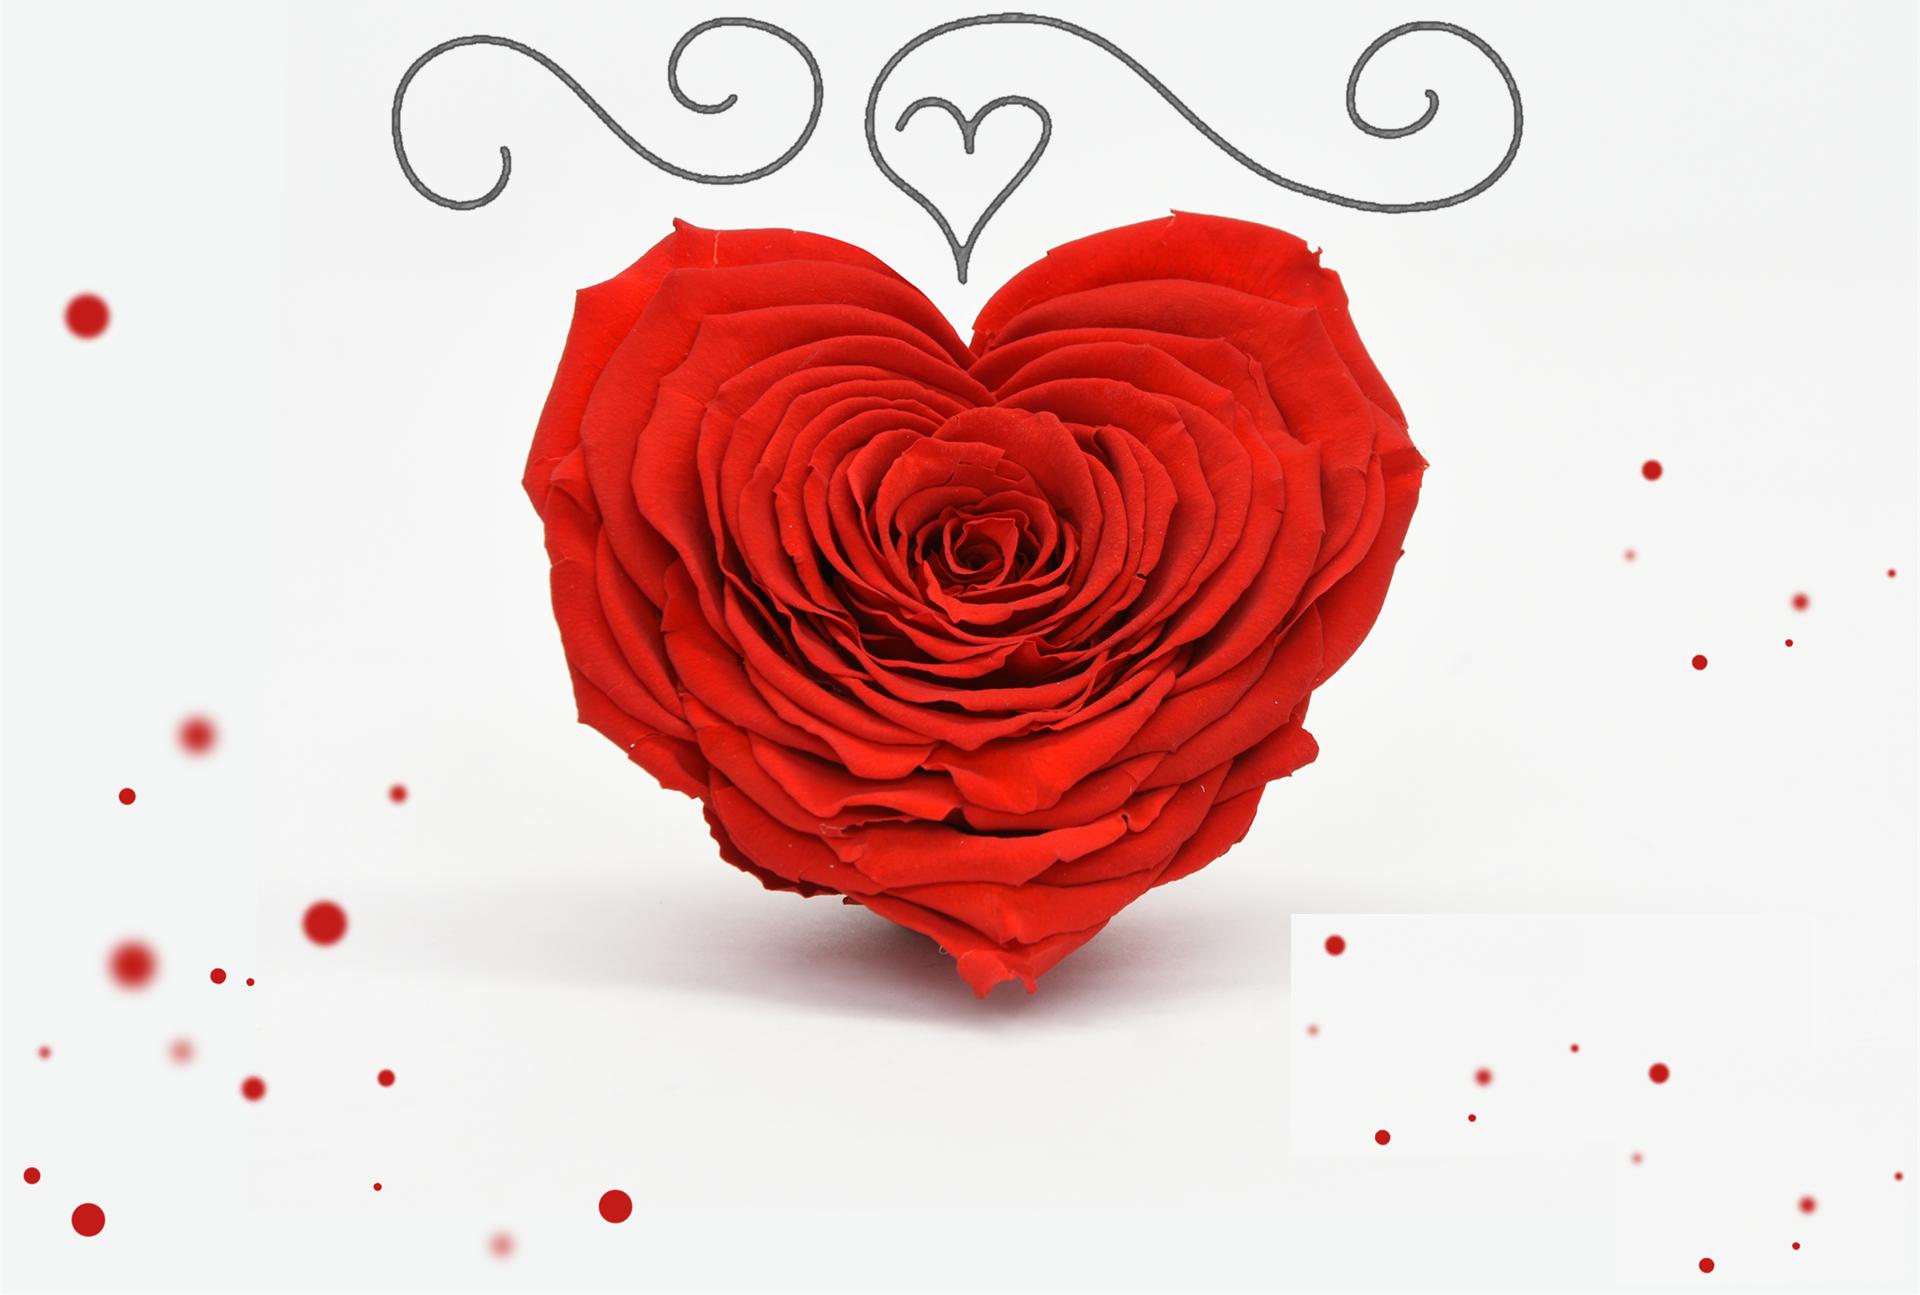 La rose coeur